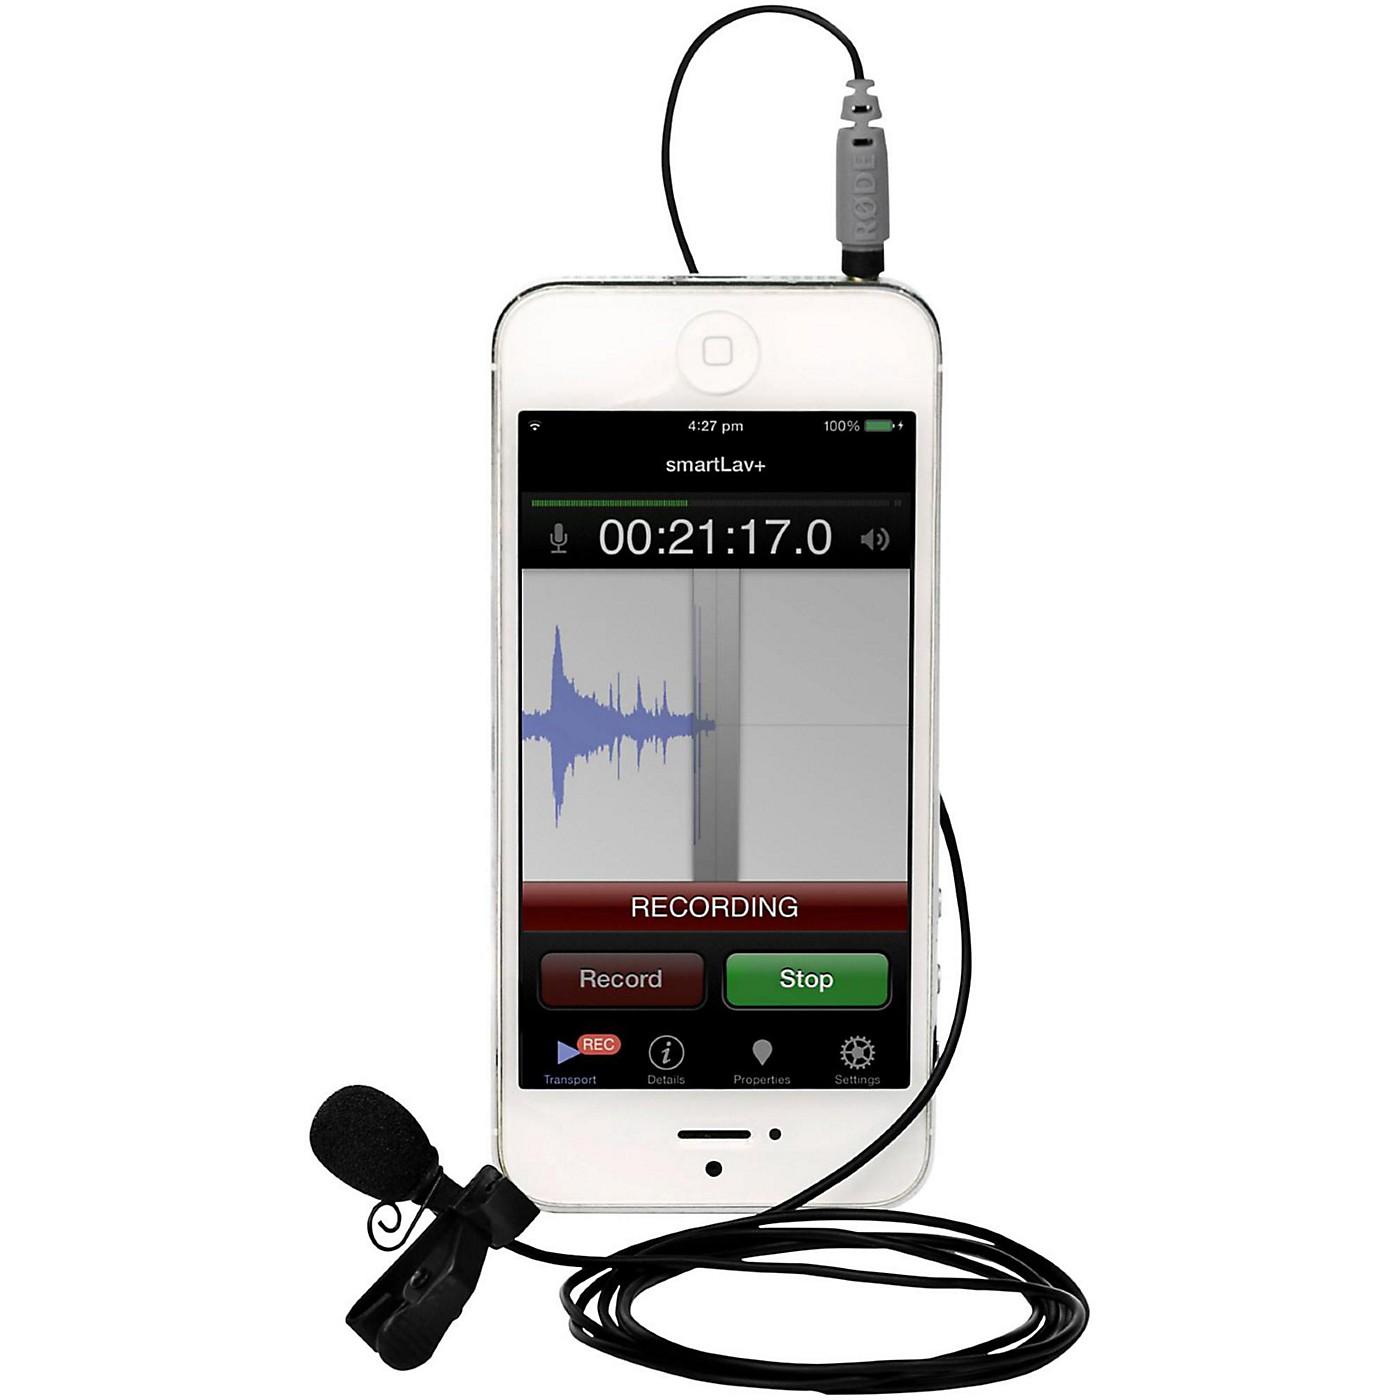 Rode smartLav+ Lavalier Microphone for Smartphones thumbnail